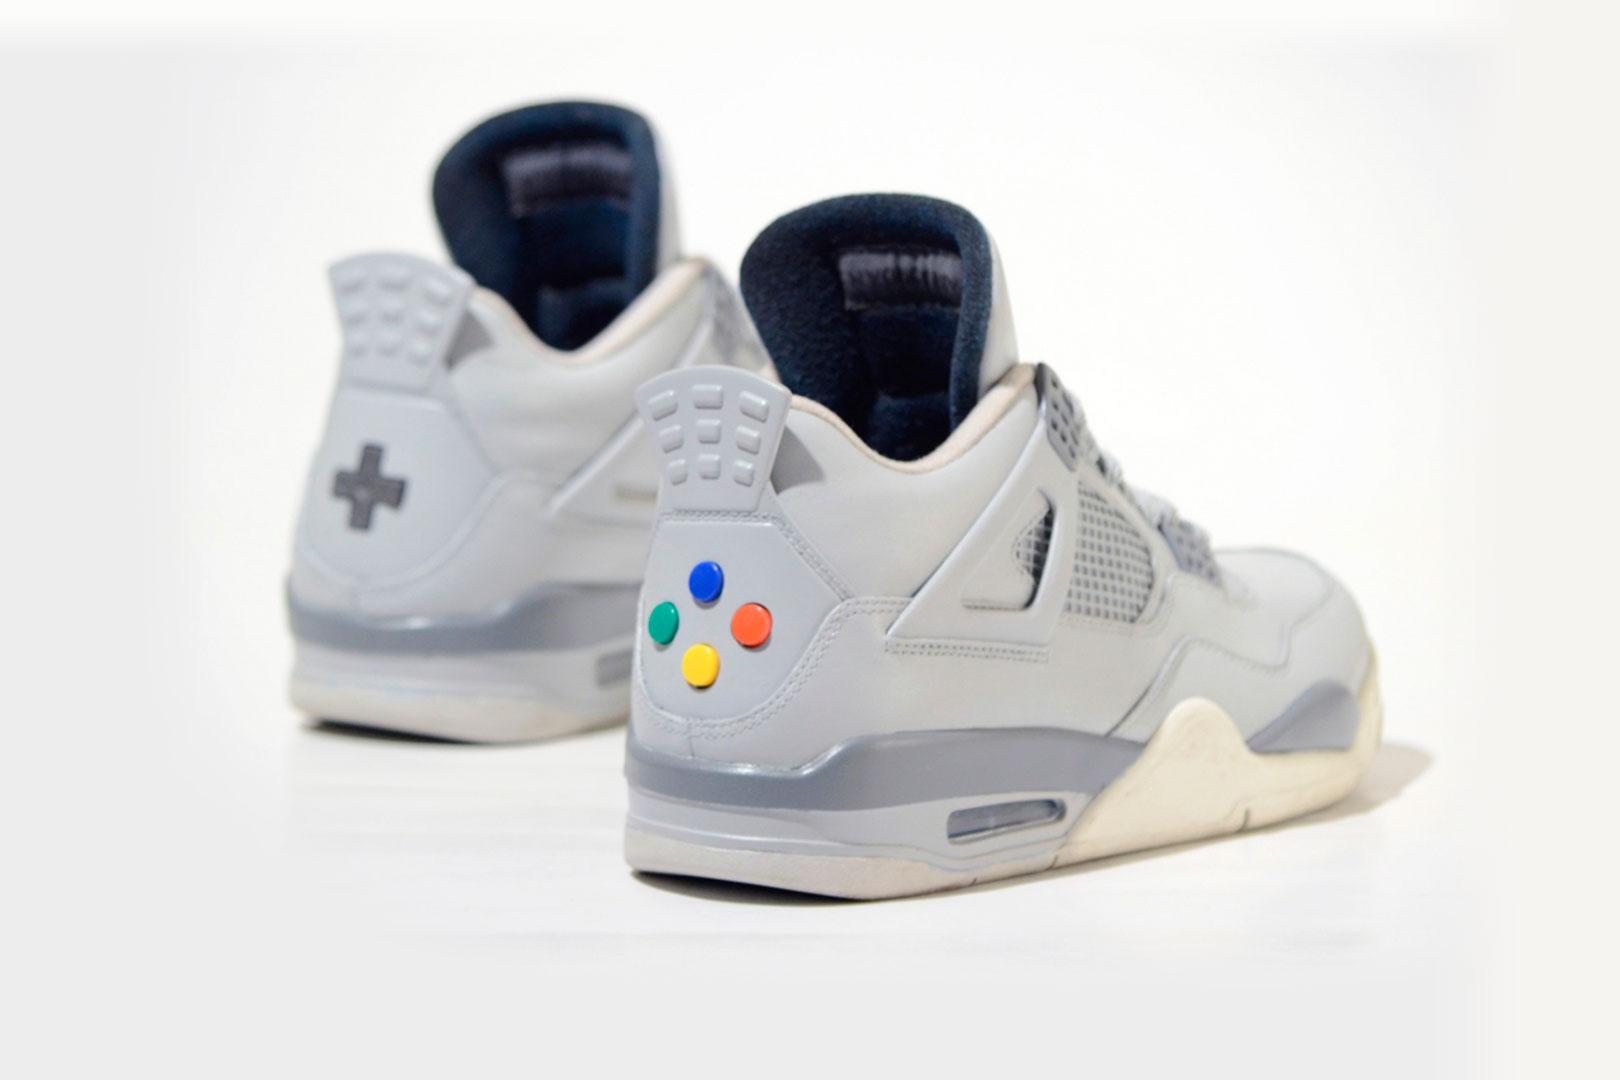 Custom Nike 'Air Jordan Nintendo' mit drückbaren Buttons